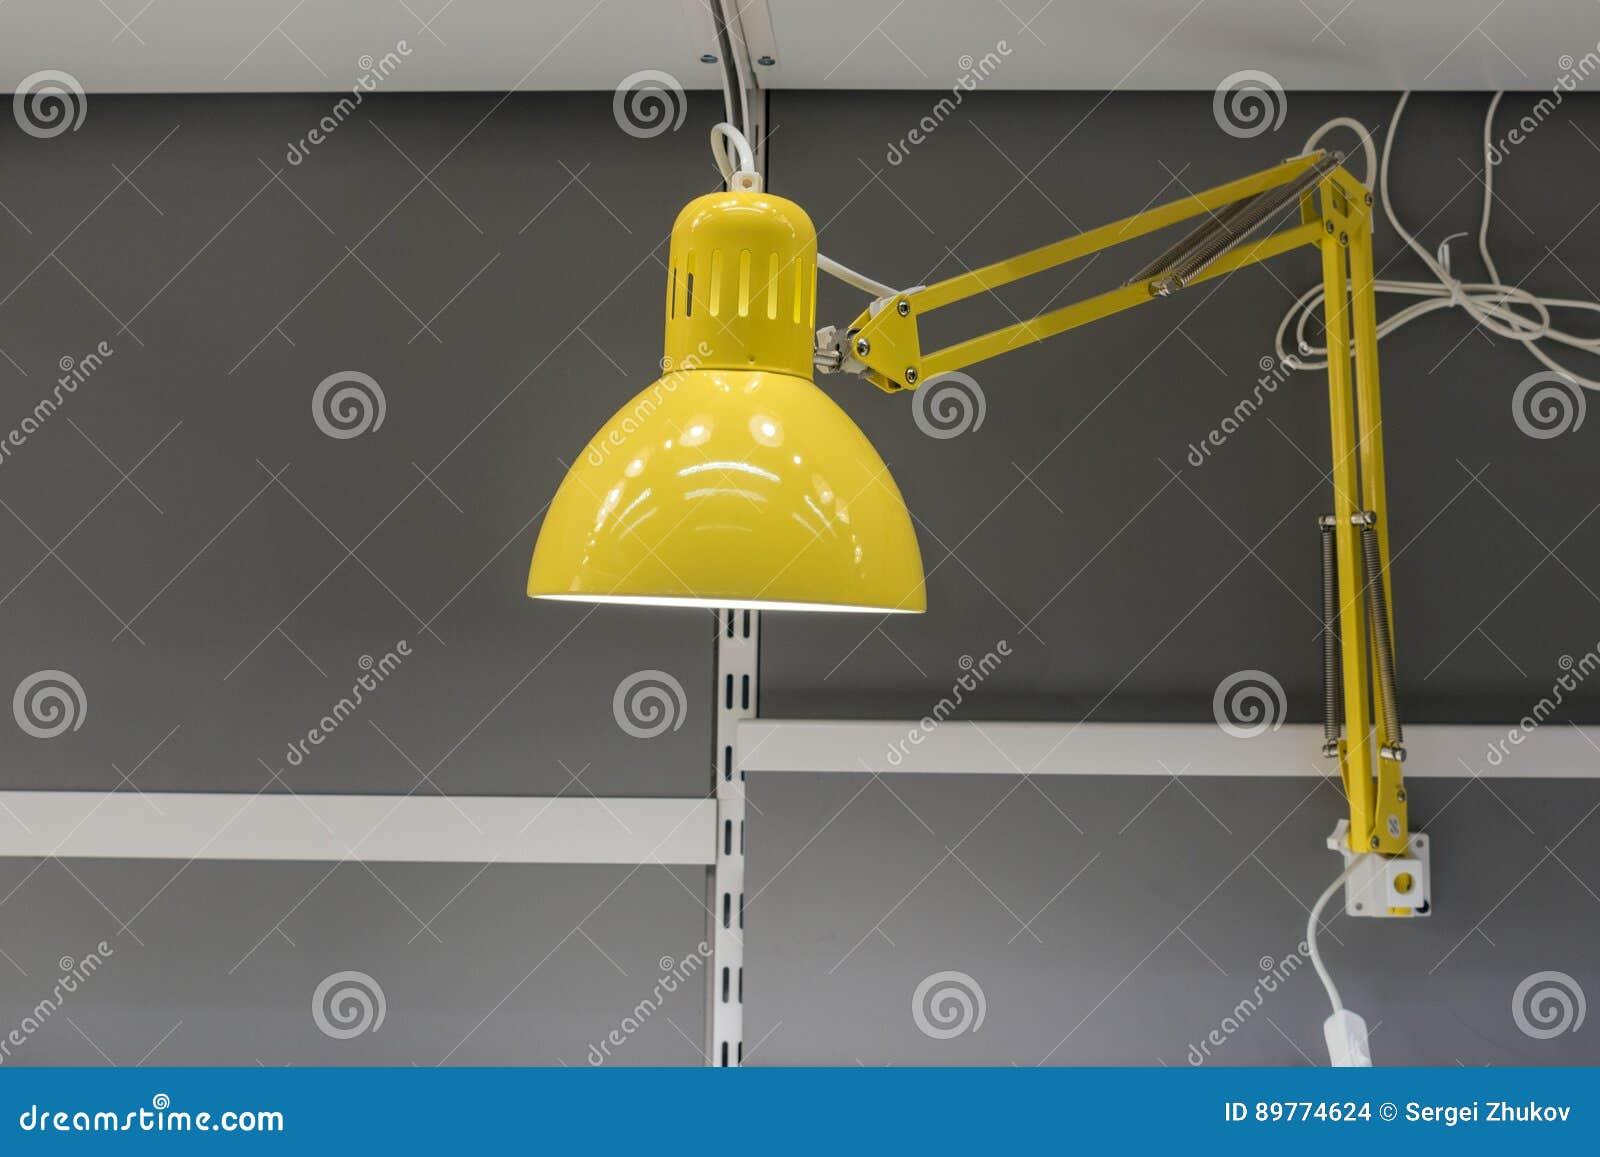 Lampe de bureau jaune photo stock image du lampe conception